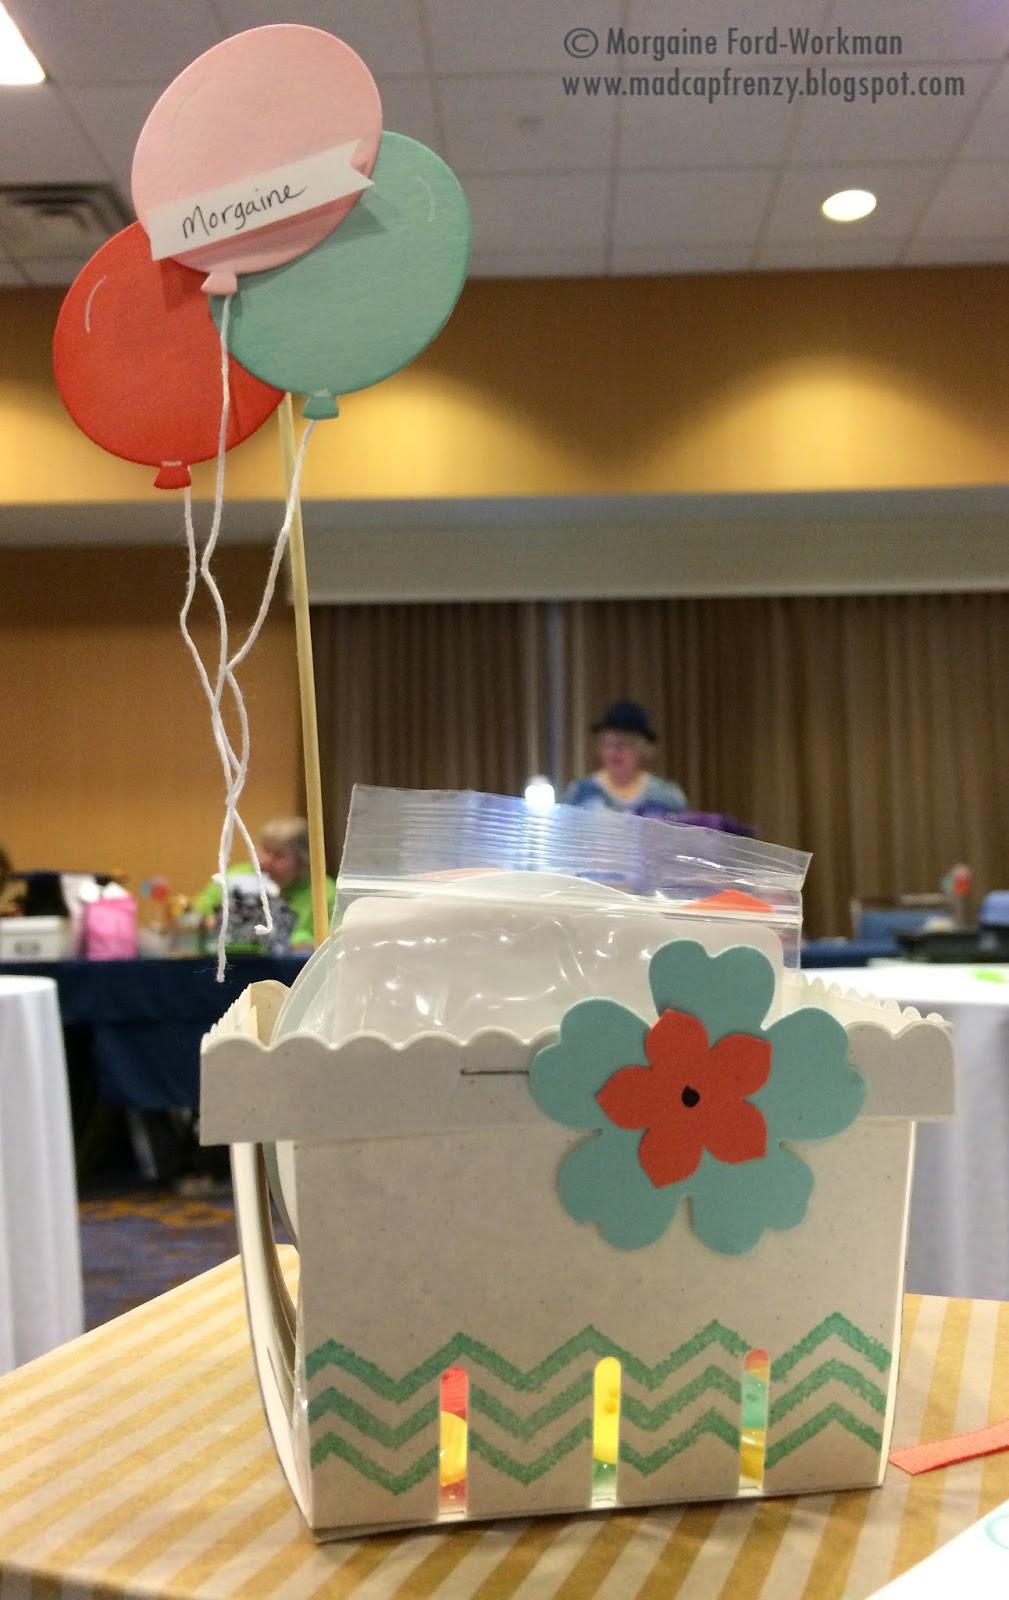 Madcap Frenzy Stampin Up! Birthday papercrafts